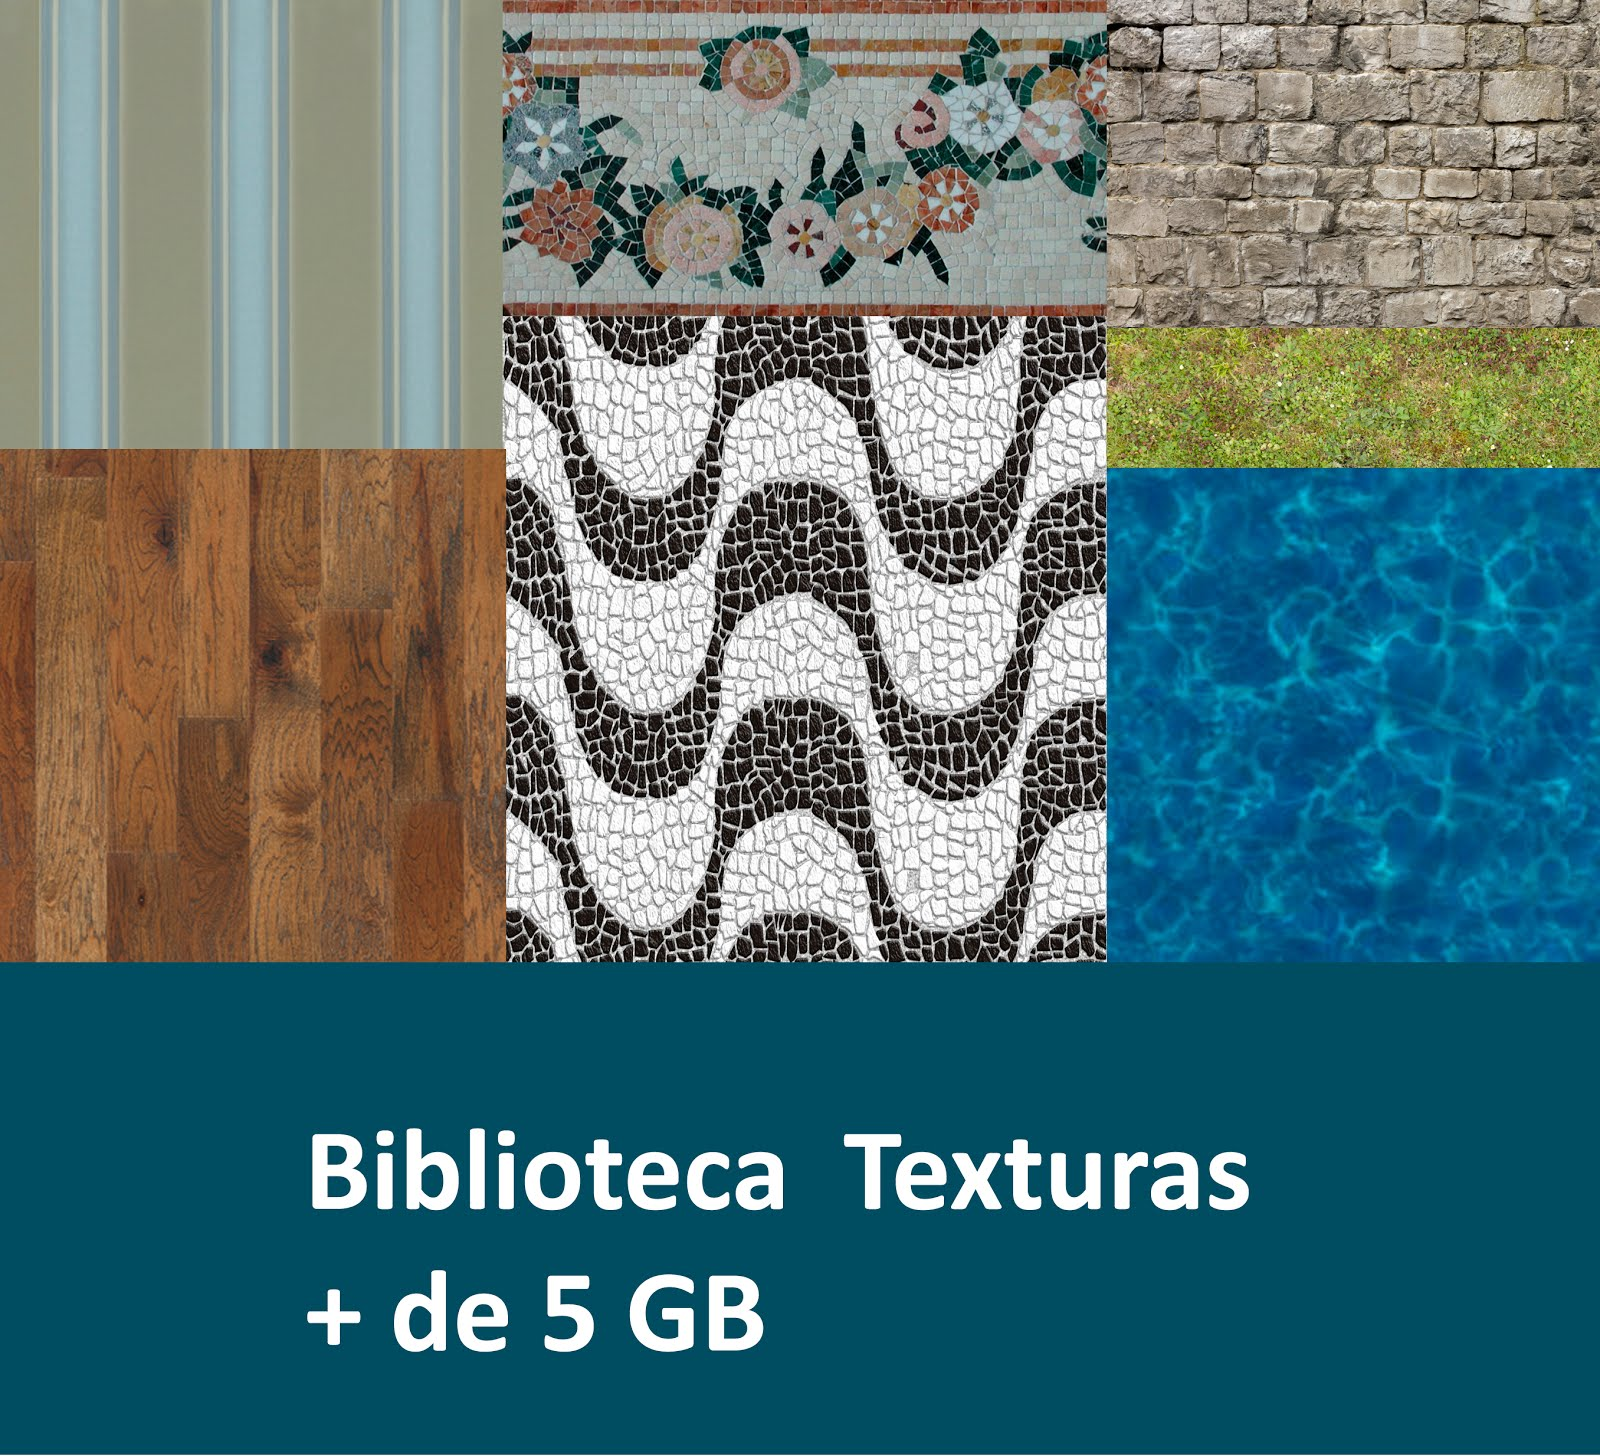 Biblioteca de Texturas